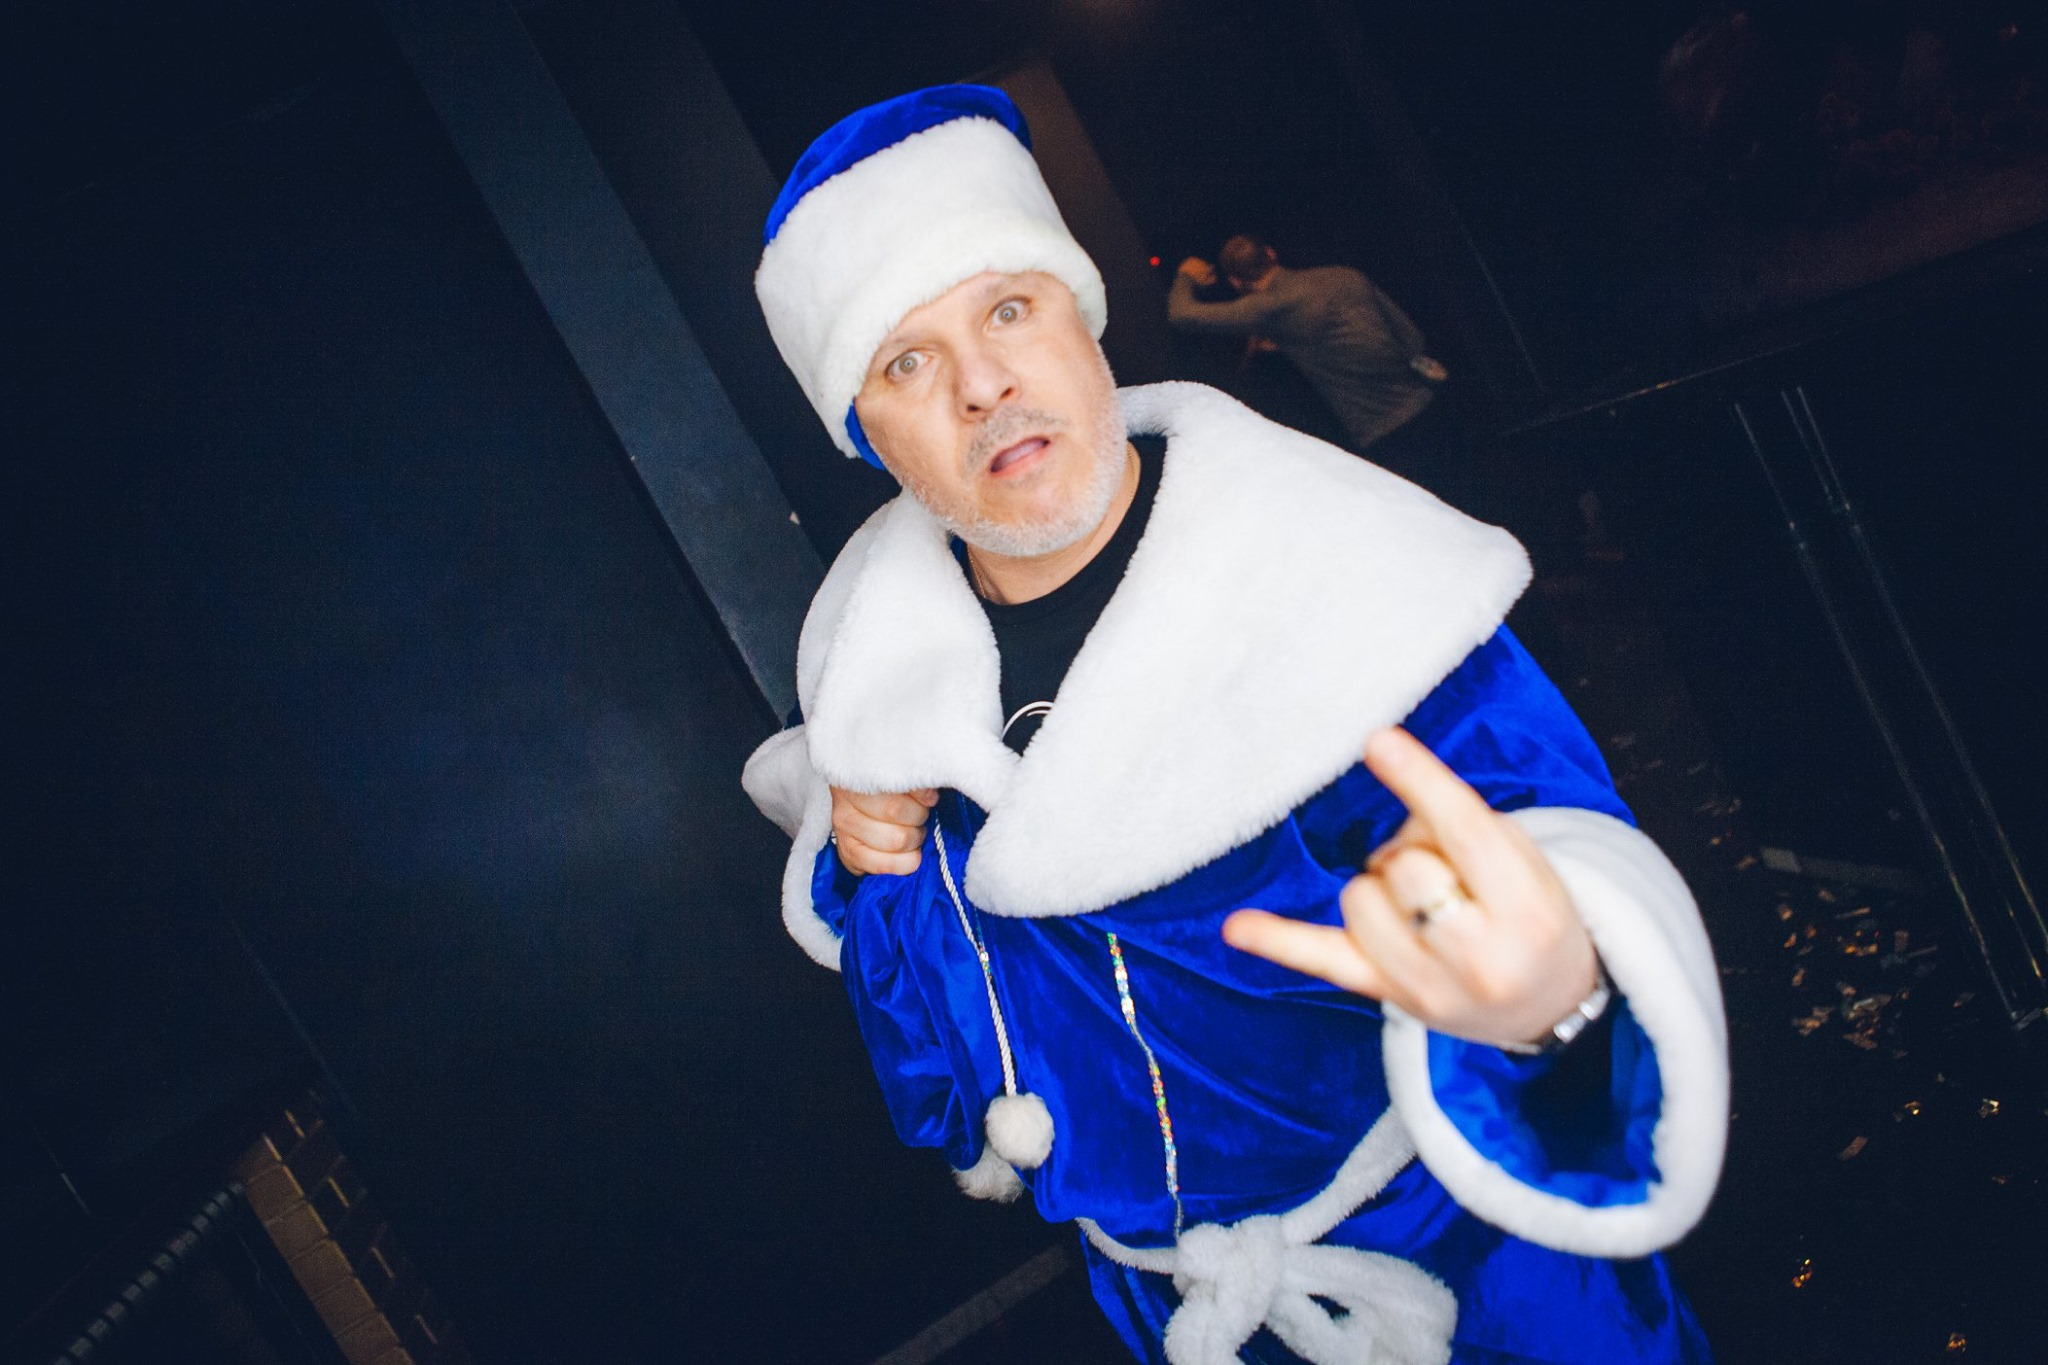 Сергей Федотов на новогоднем корпоративе